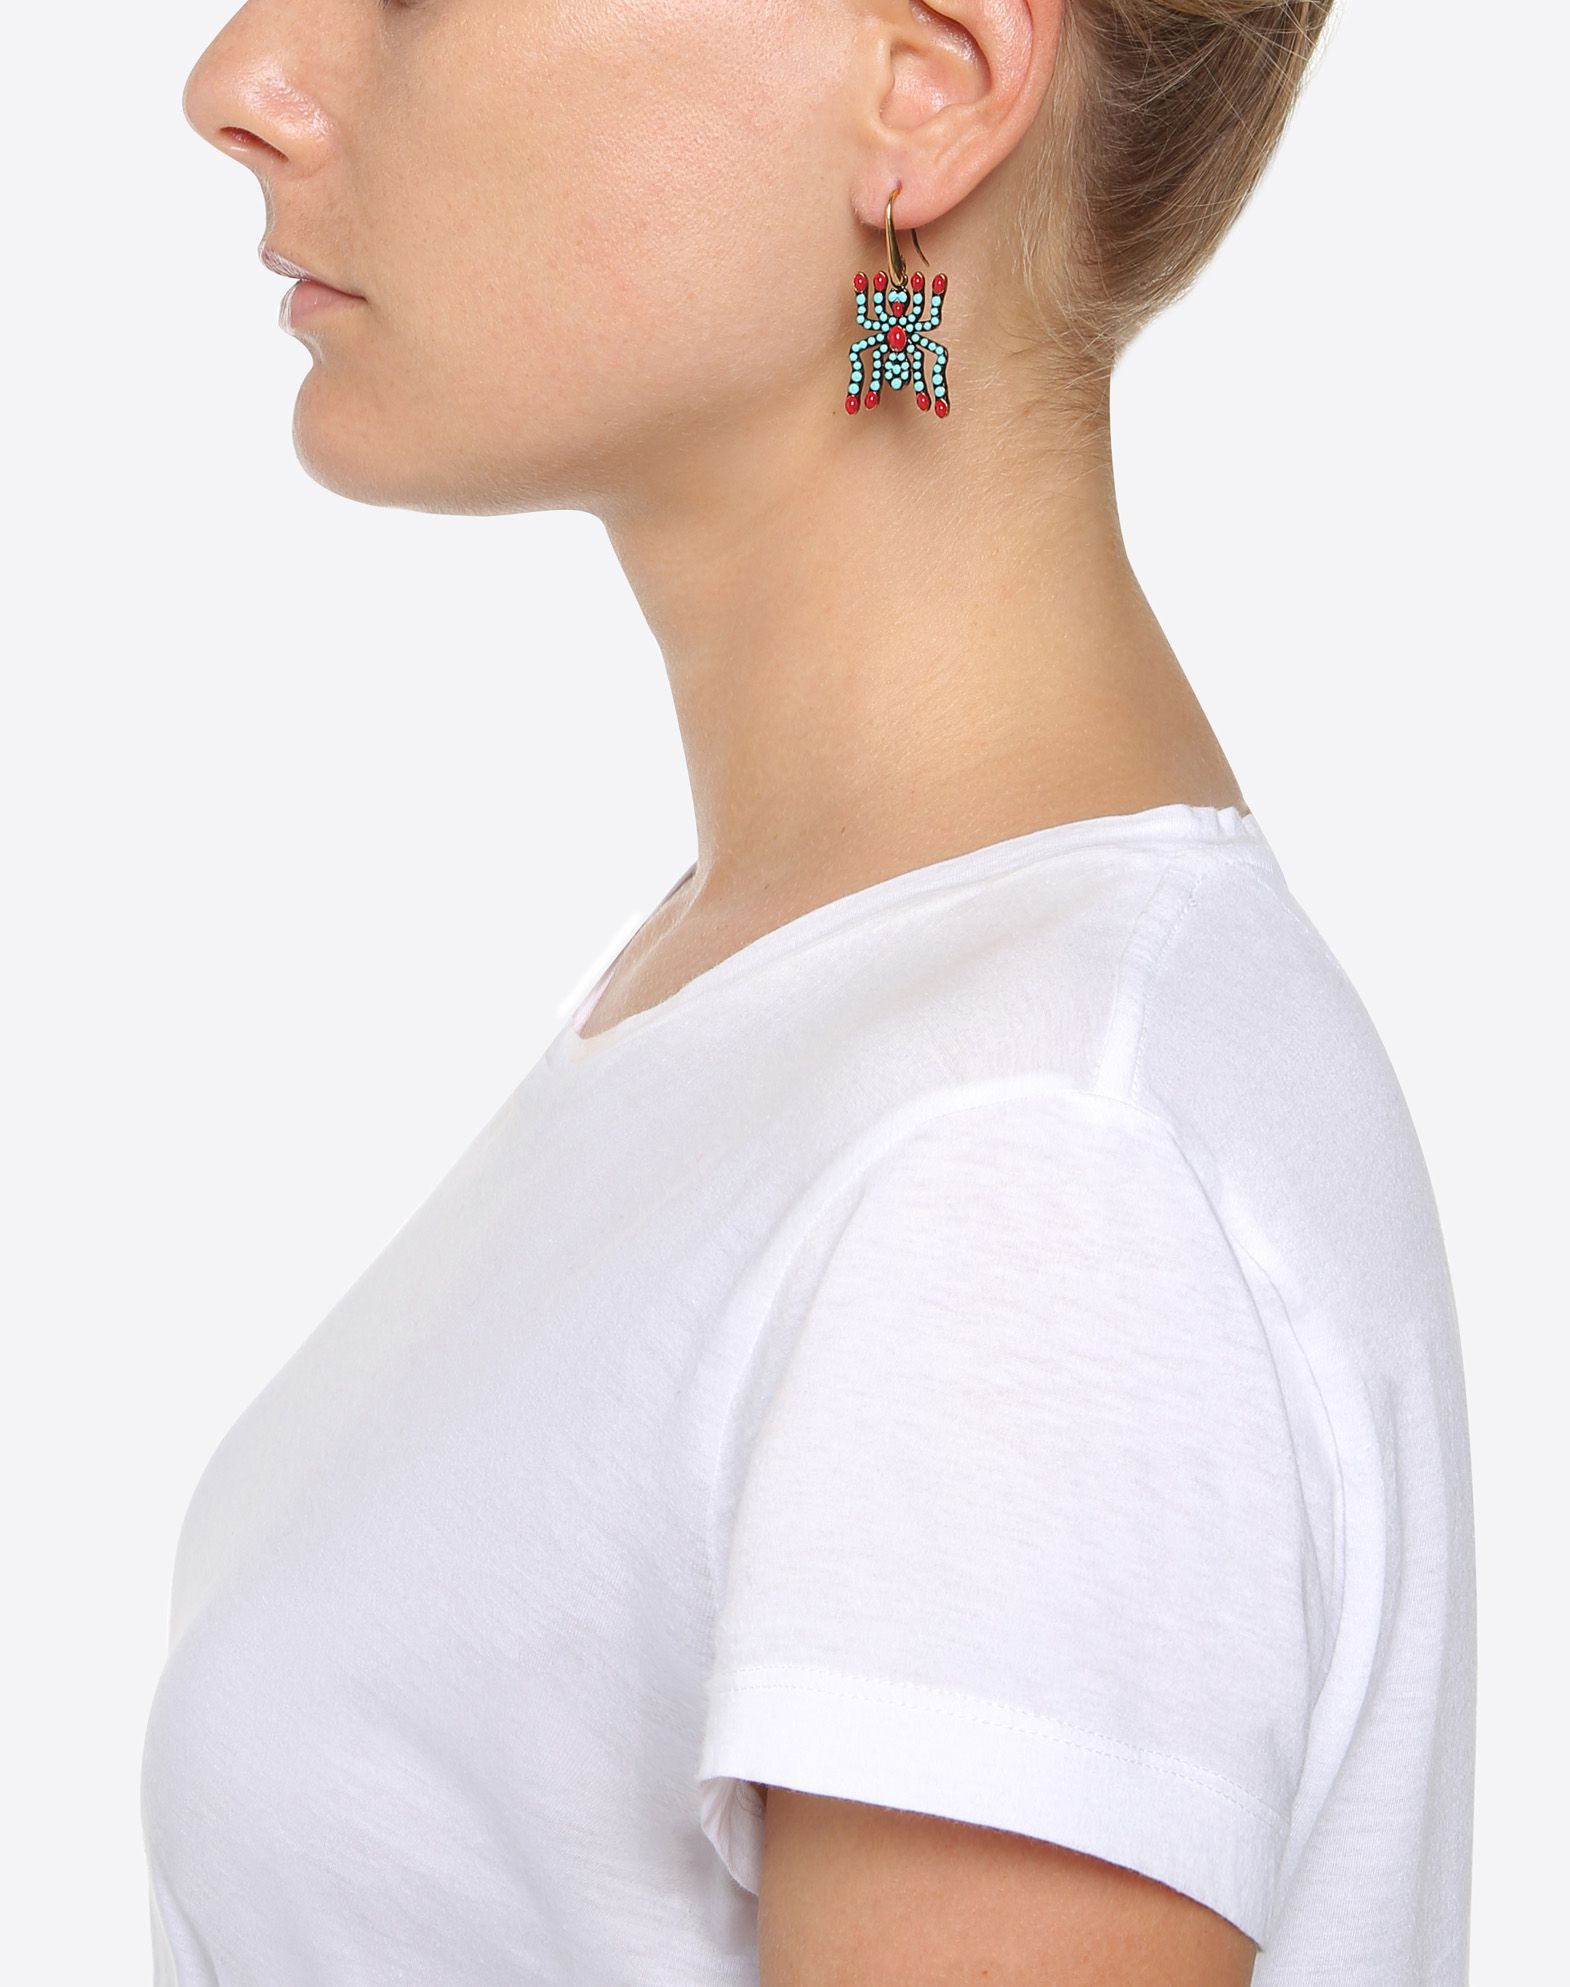 VALENTINO GARAVANI Spider Earrings Earrings D a